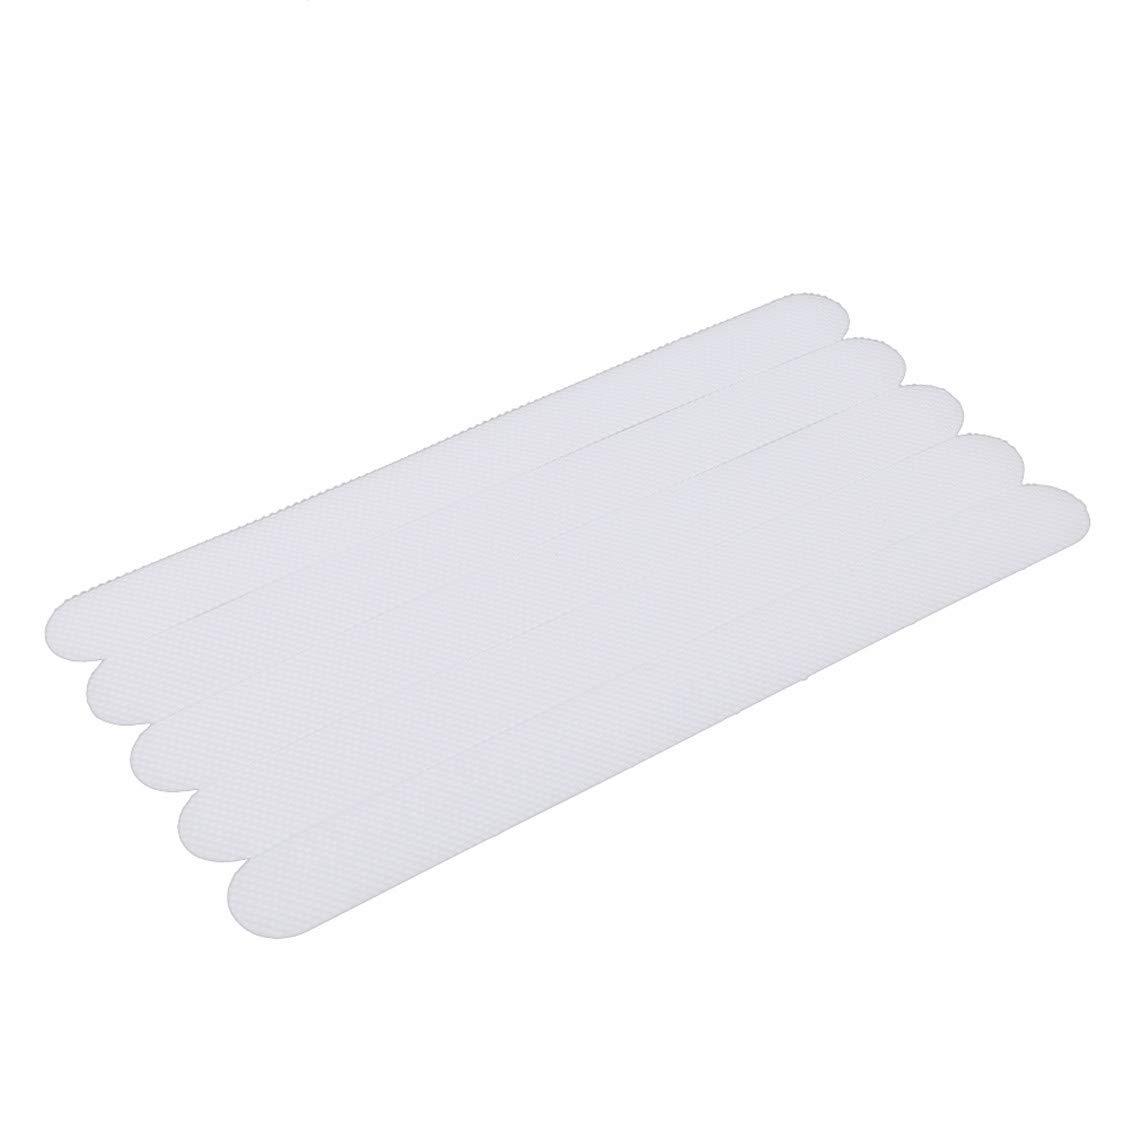 Rurah Anti-Slip Strips Non Slip Treads Tape Shower Stickers Bath Safety Strips Transparent Non Slip Strips Stickers for Bathtubs Showers